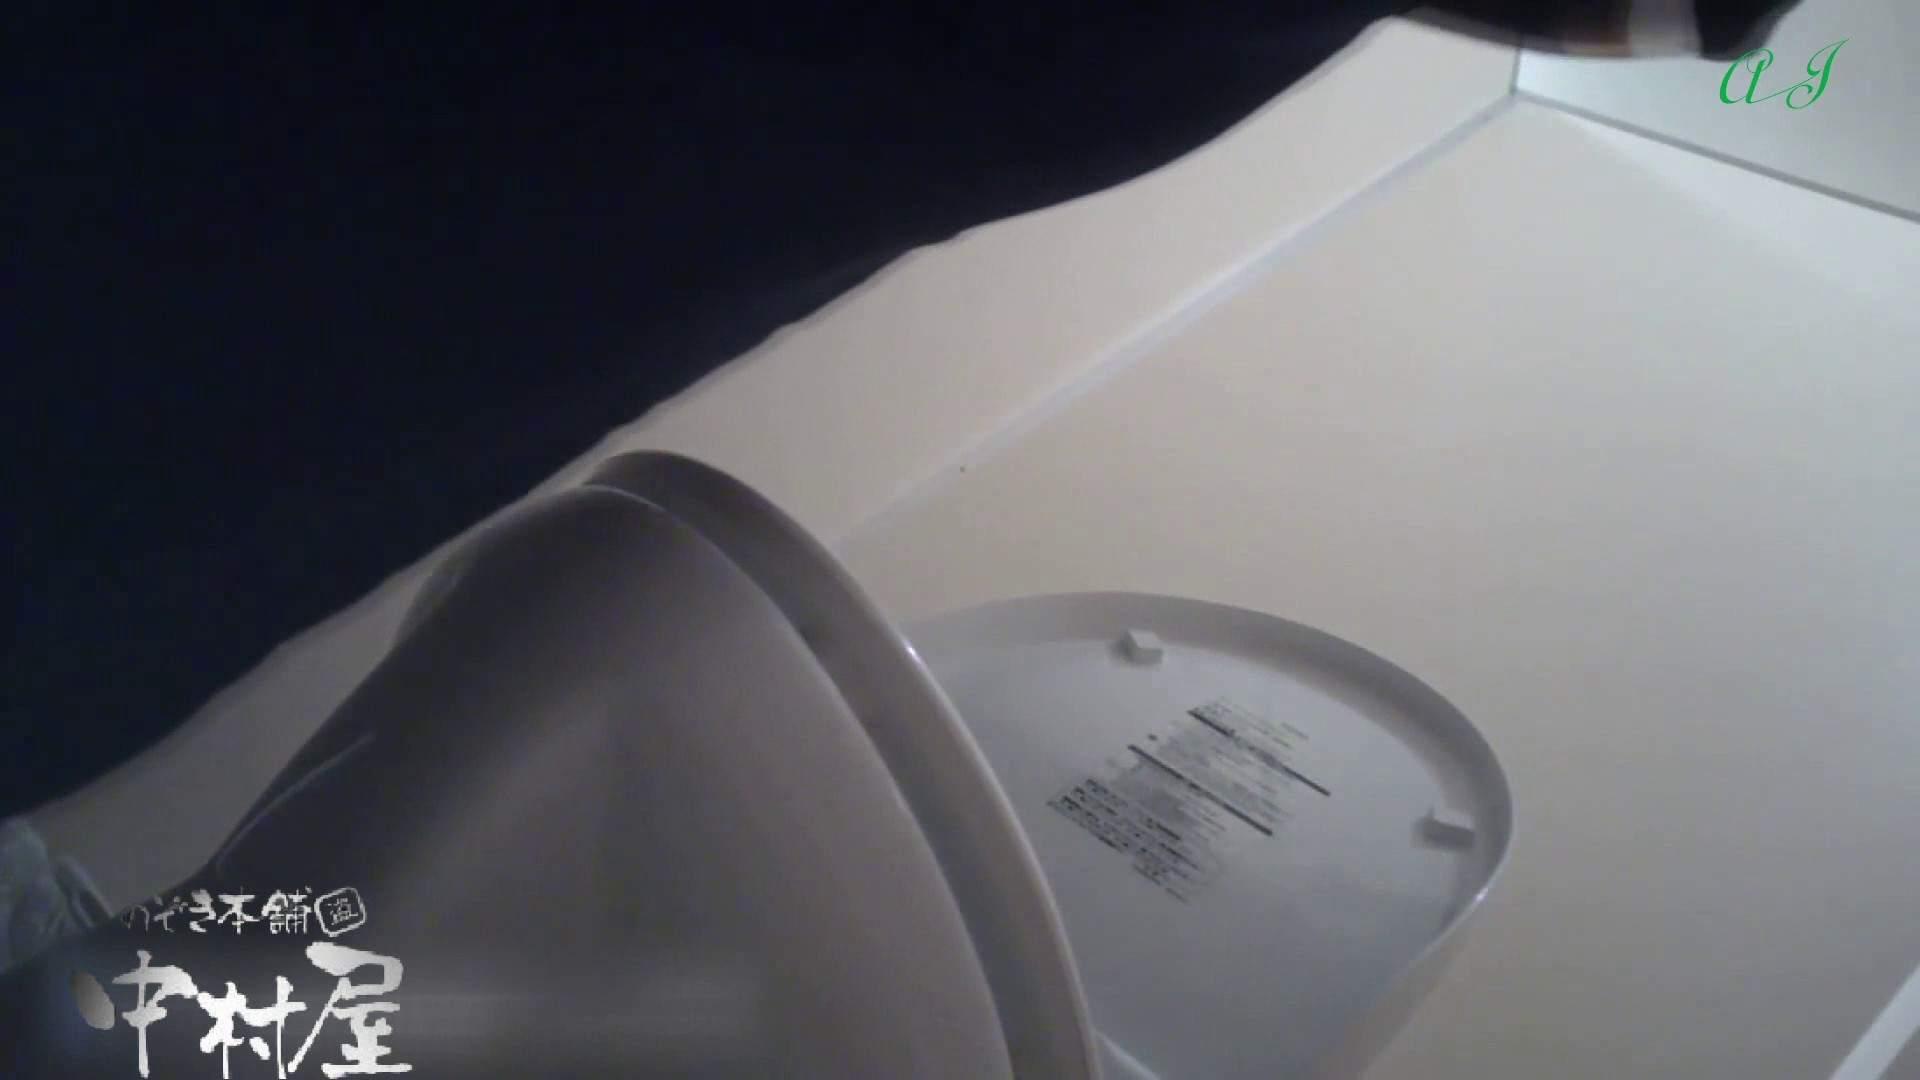 新アングル 4名の美女達 有名大学女性洗面所 vol.76 潜入 ワレメ動画紹介 77枚 2